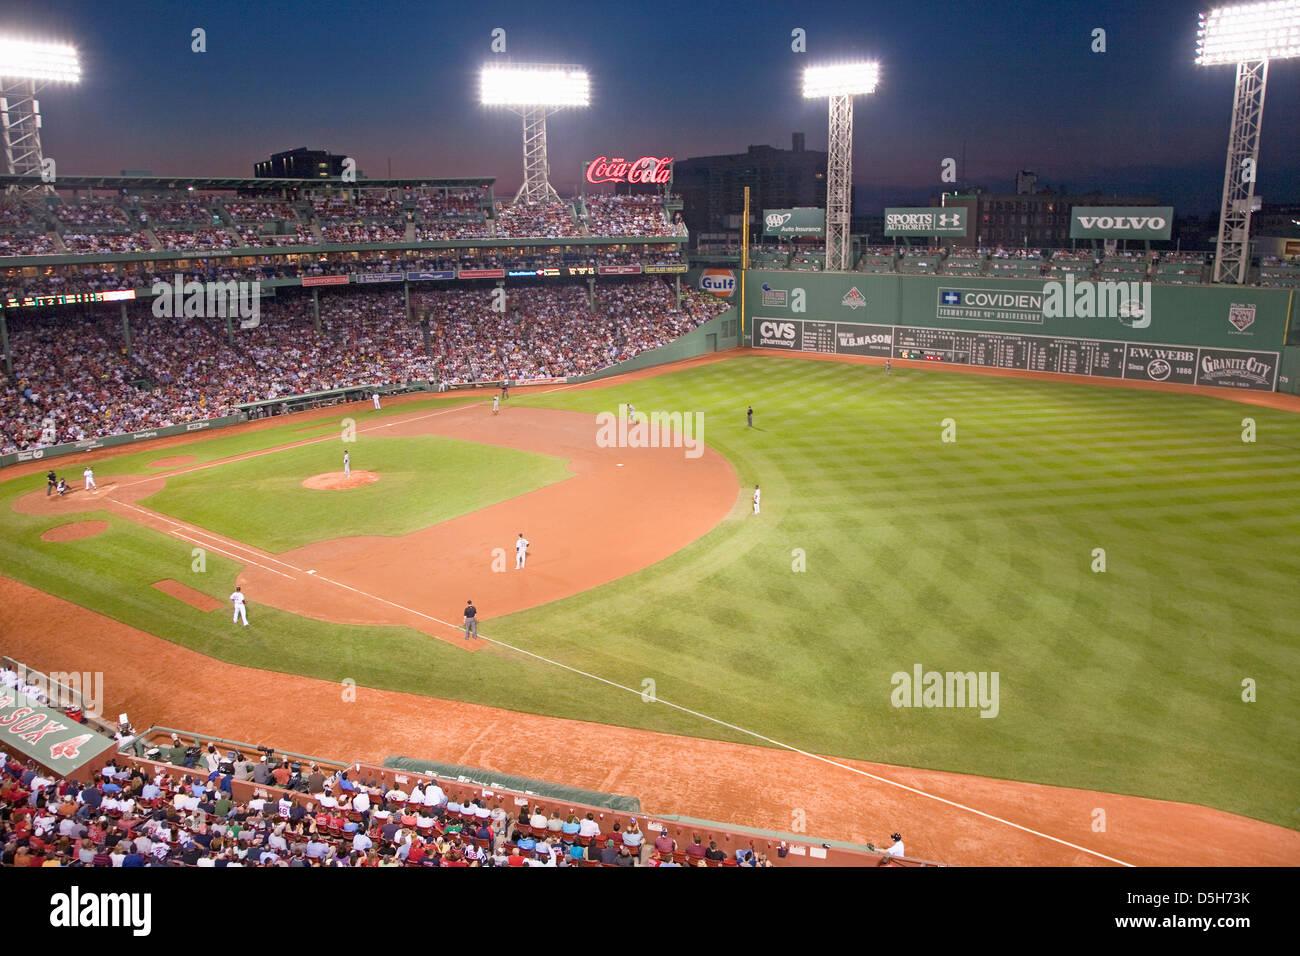 Fenway Park Red Sox Stadium Stock Photos & Fenway Park Red Sox ...